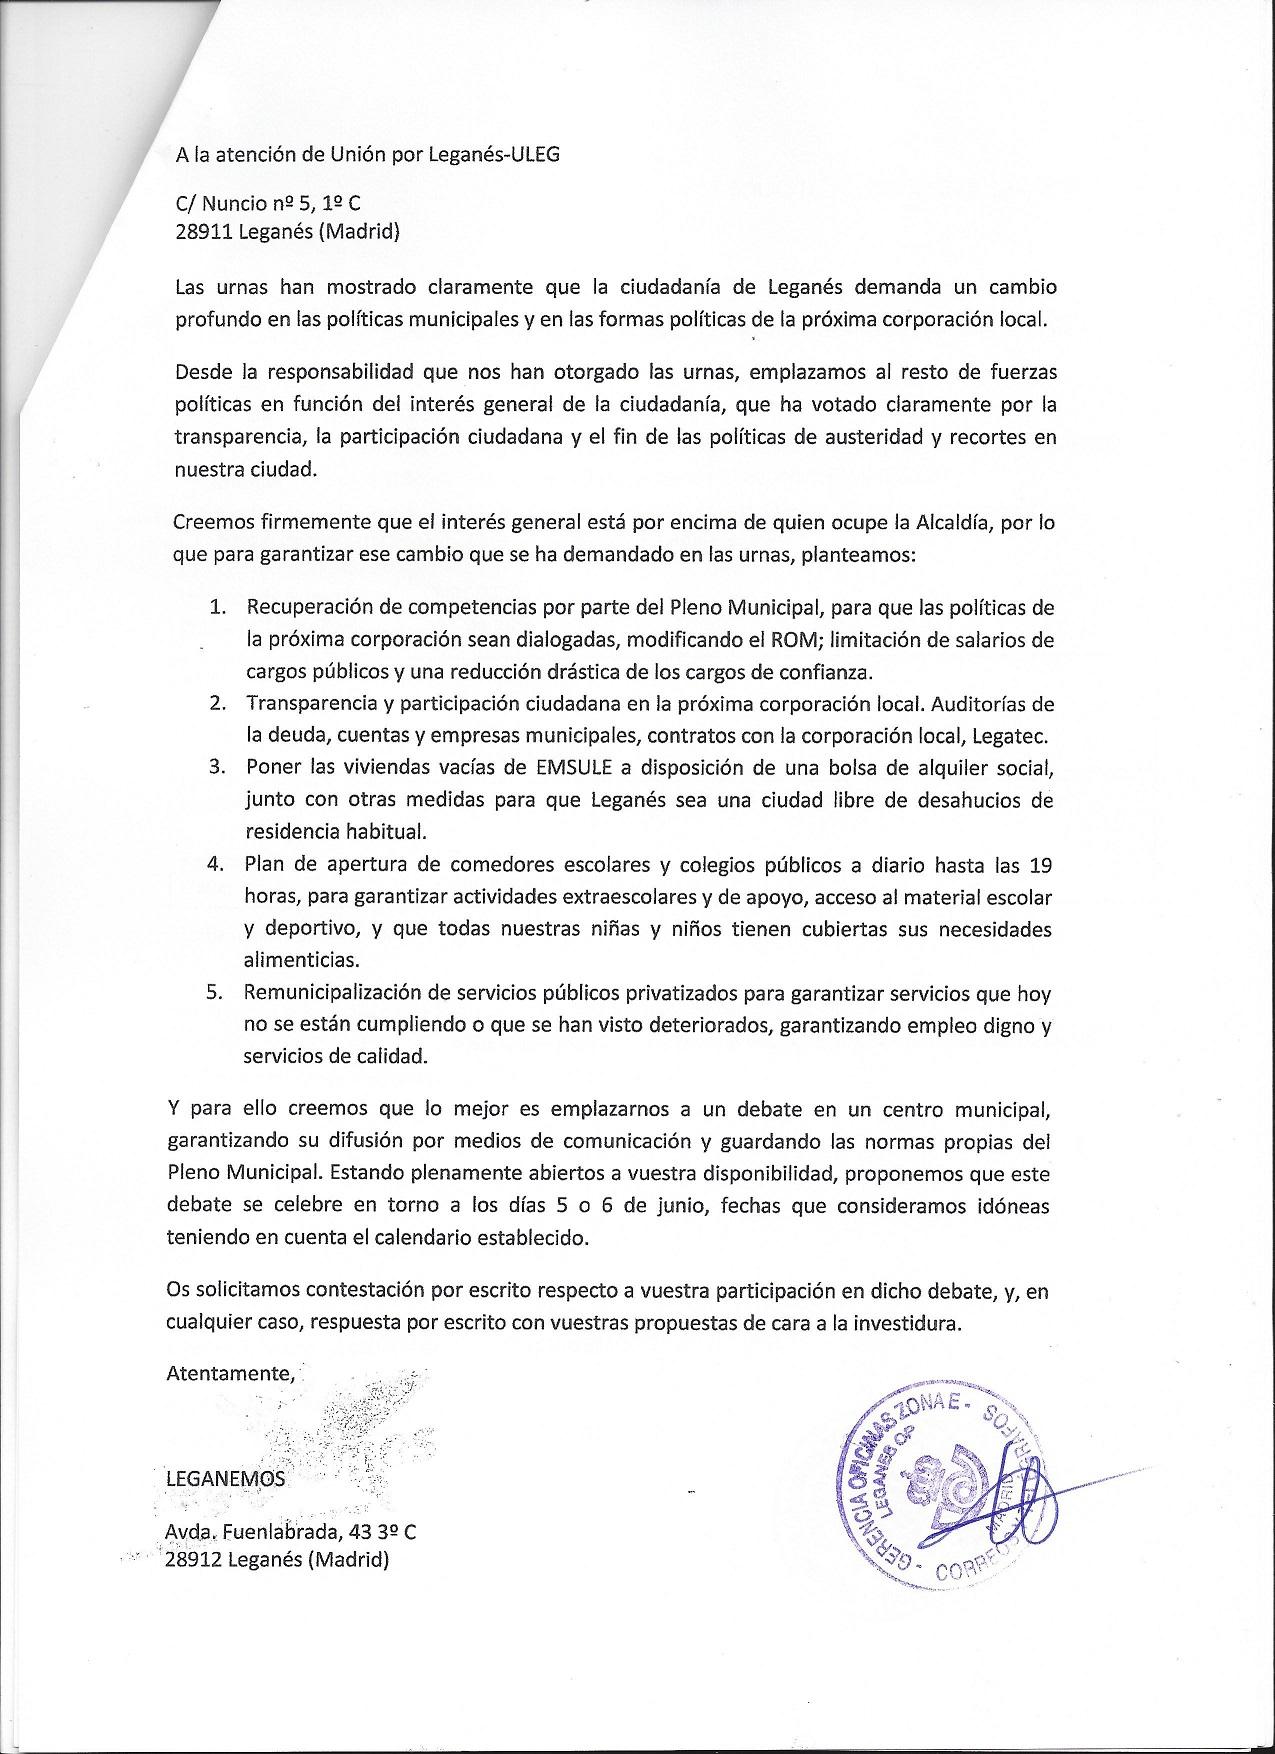 Burofax de Leganemos a ULEG